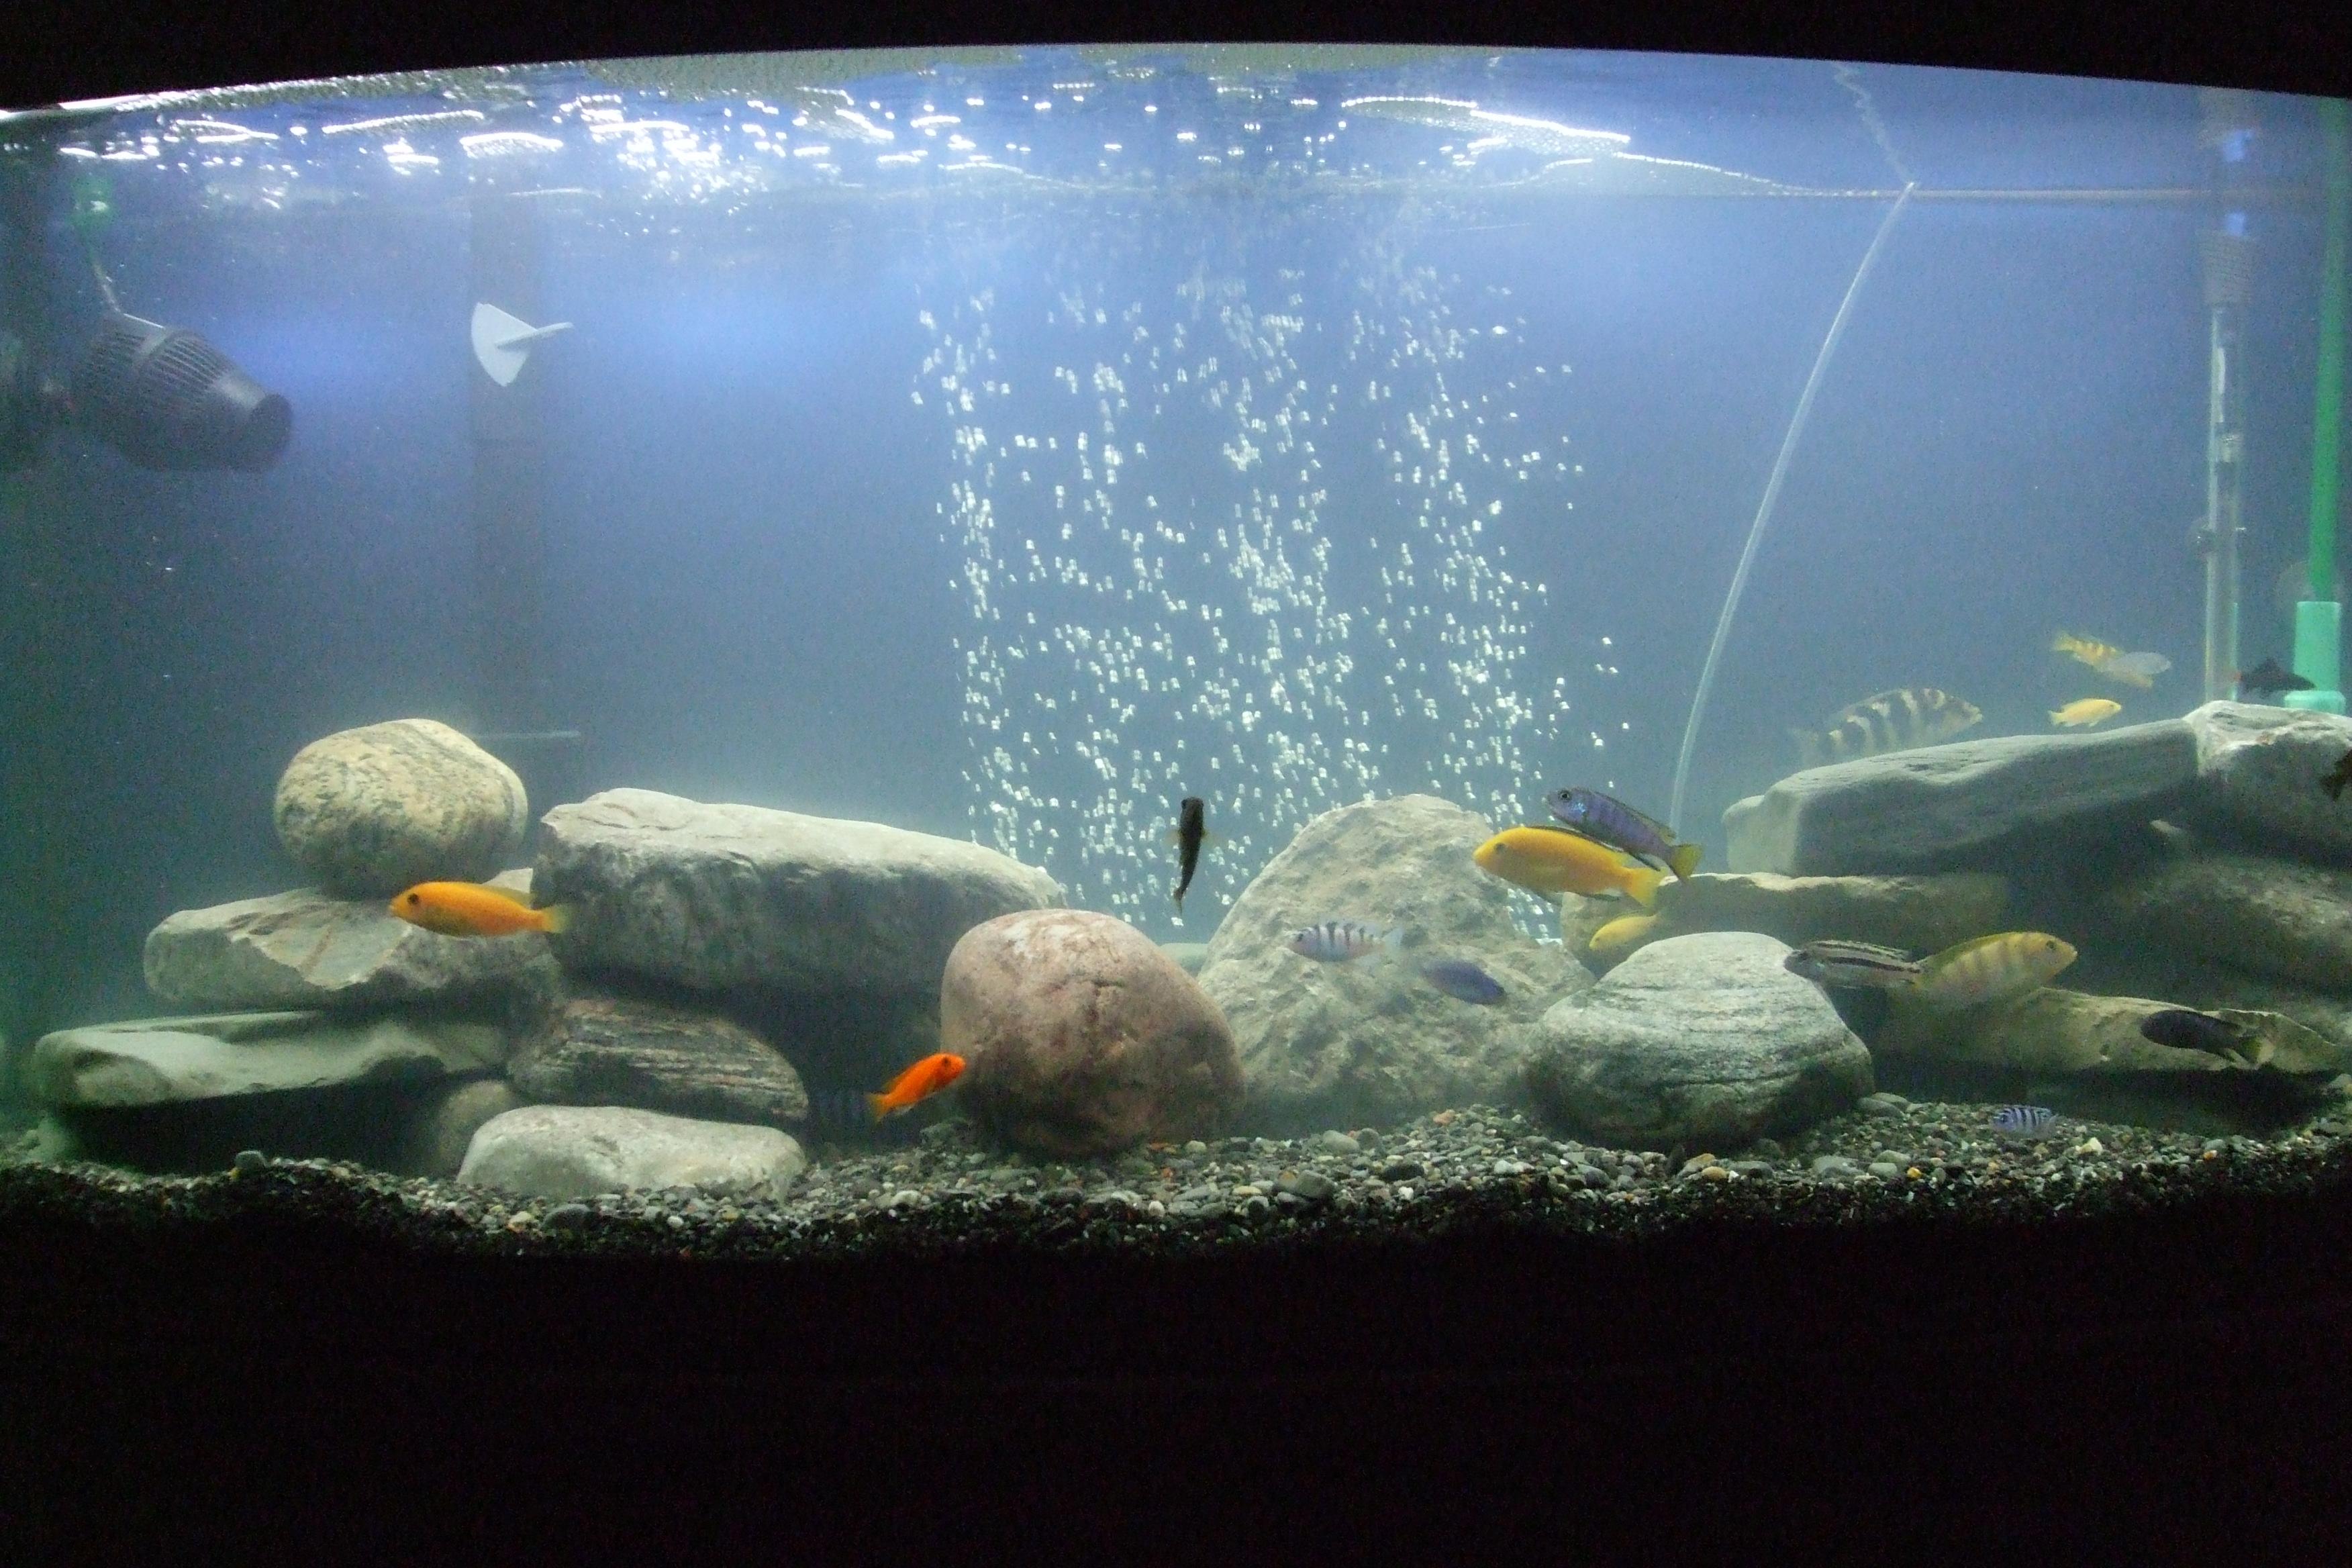 Aquarium bacteria bloom 1000 aquarium ideas for Bacterial bloom fish tank